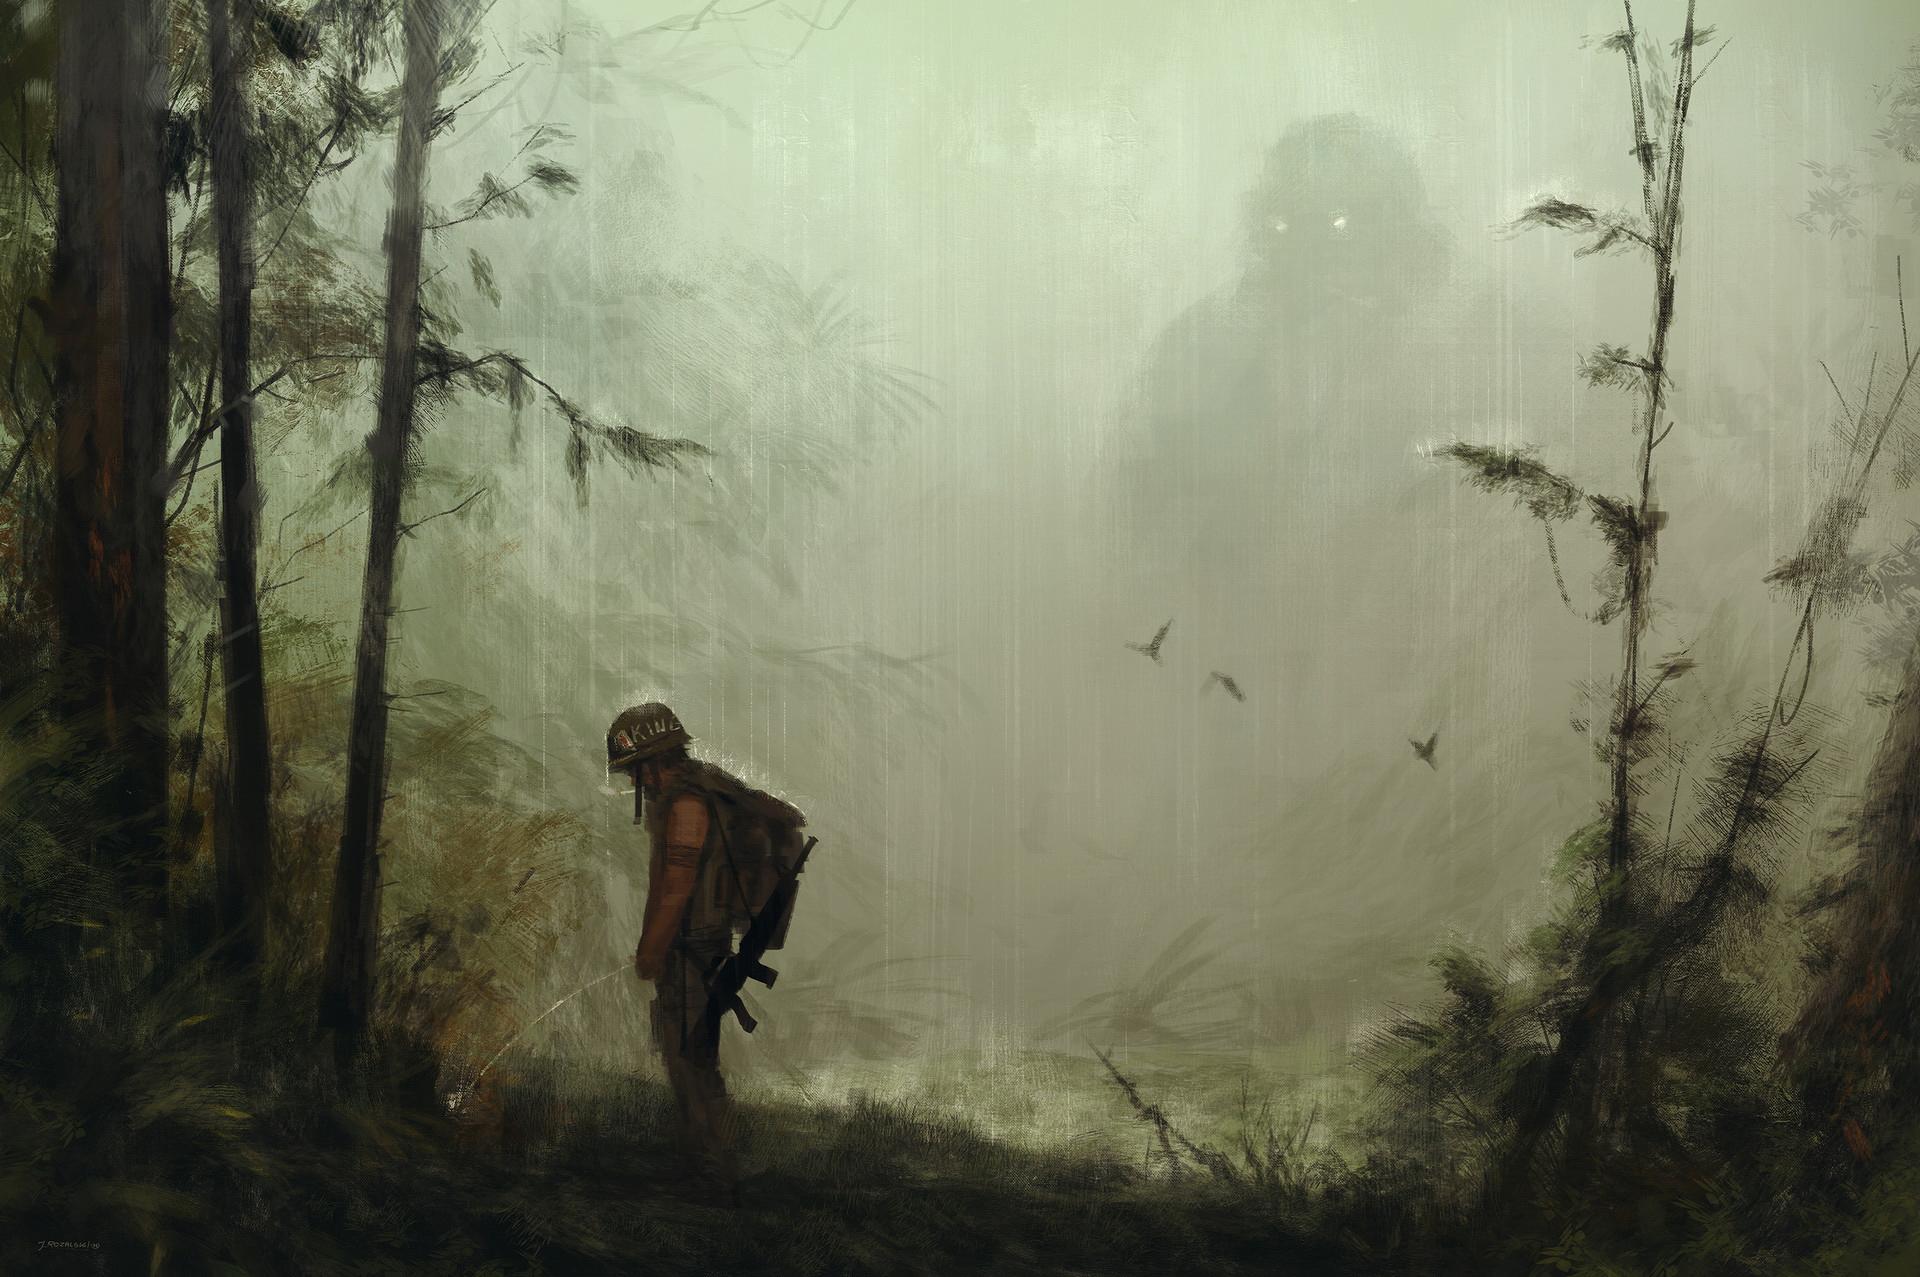 Kong Skull Island Rain Silhouette 1920x1277